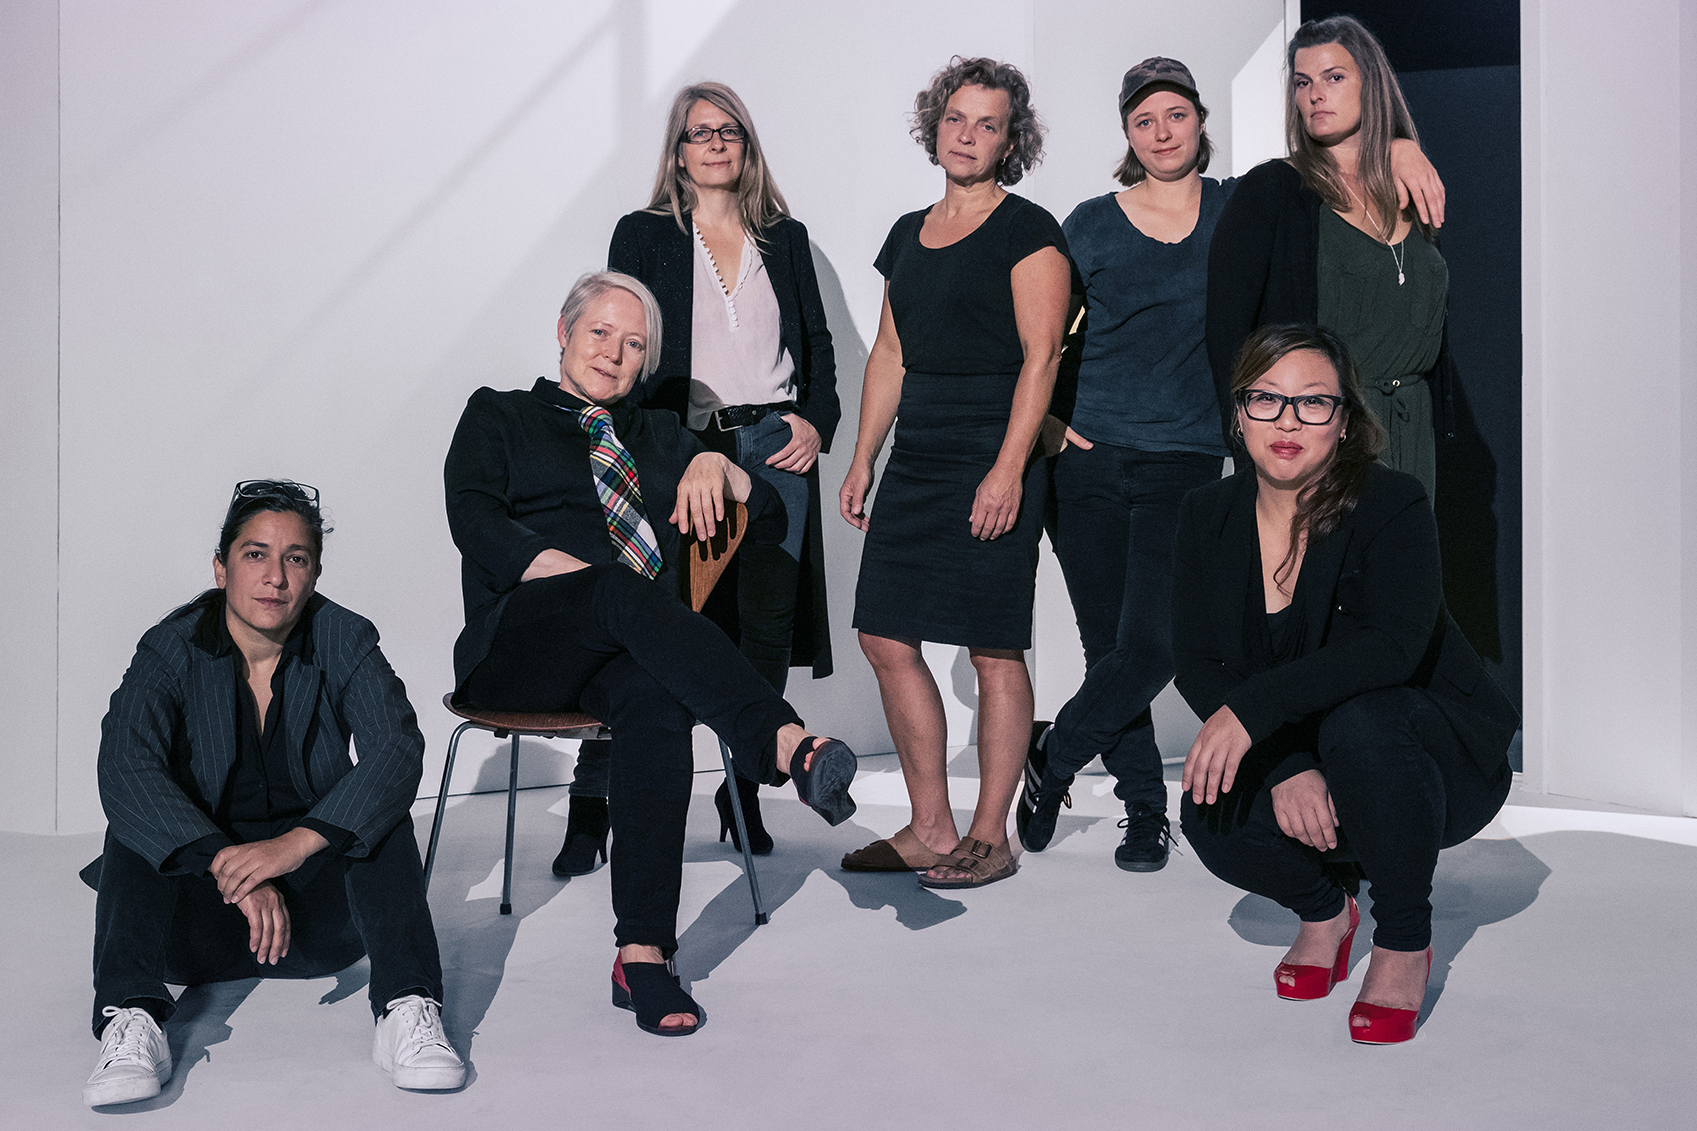 Sonja Lea, Madeleine Røn Juul, Gøje Rostrup, Gitte Knudsen, Weronika Andersen, Maja Ries og Joan Rang Christensen. Foto: Thomas Cato